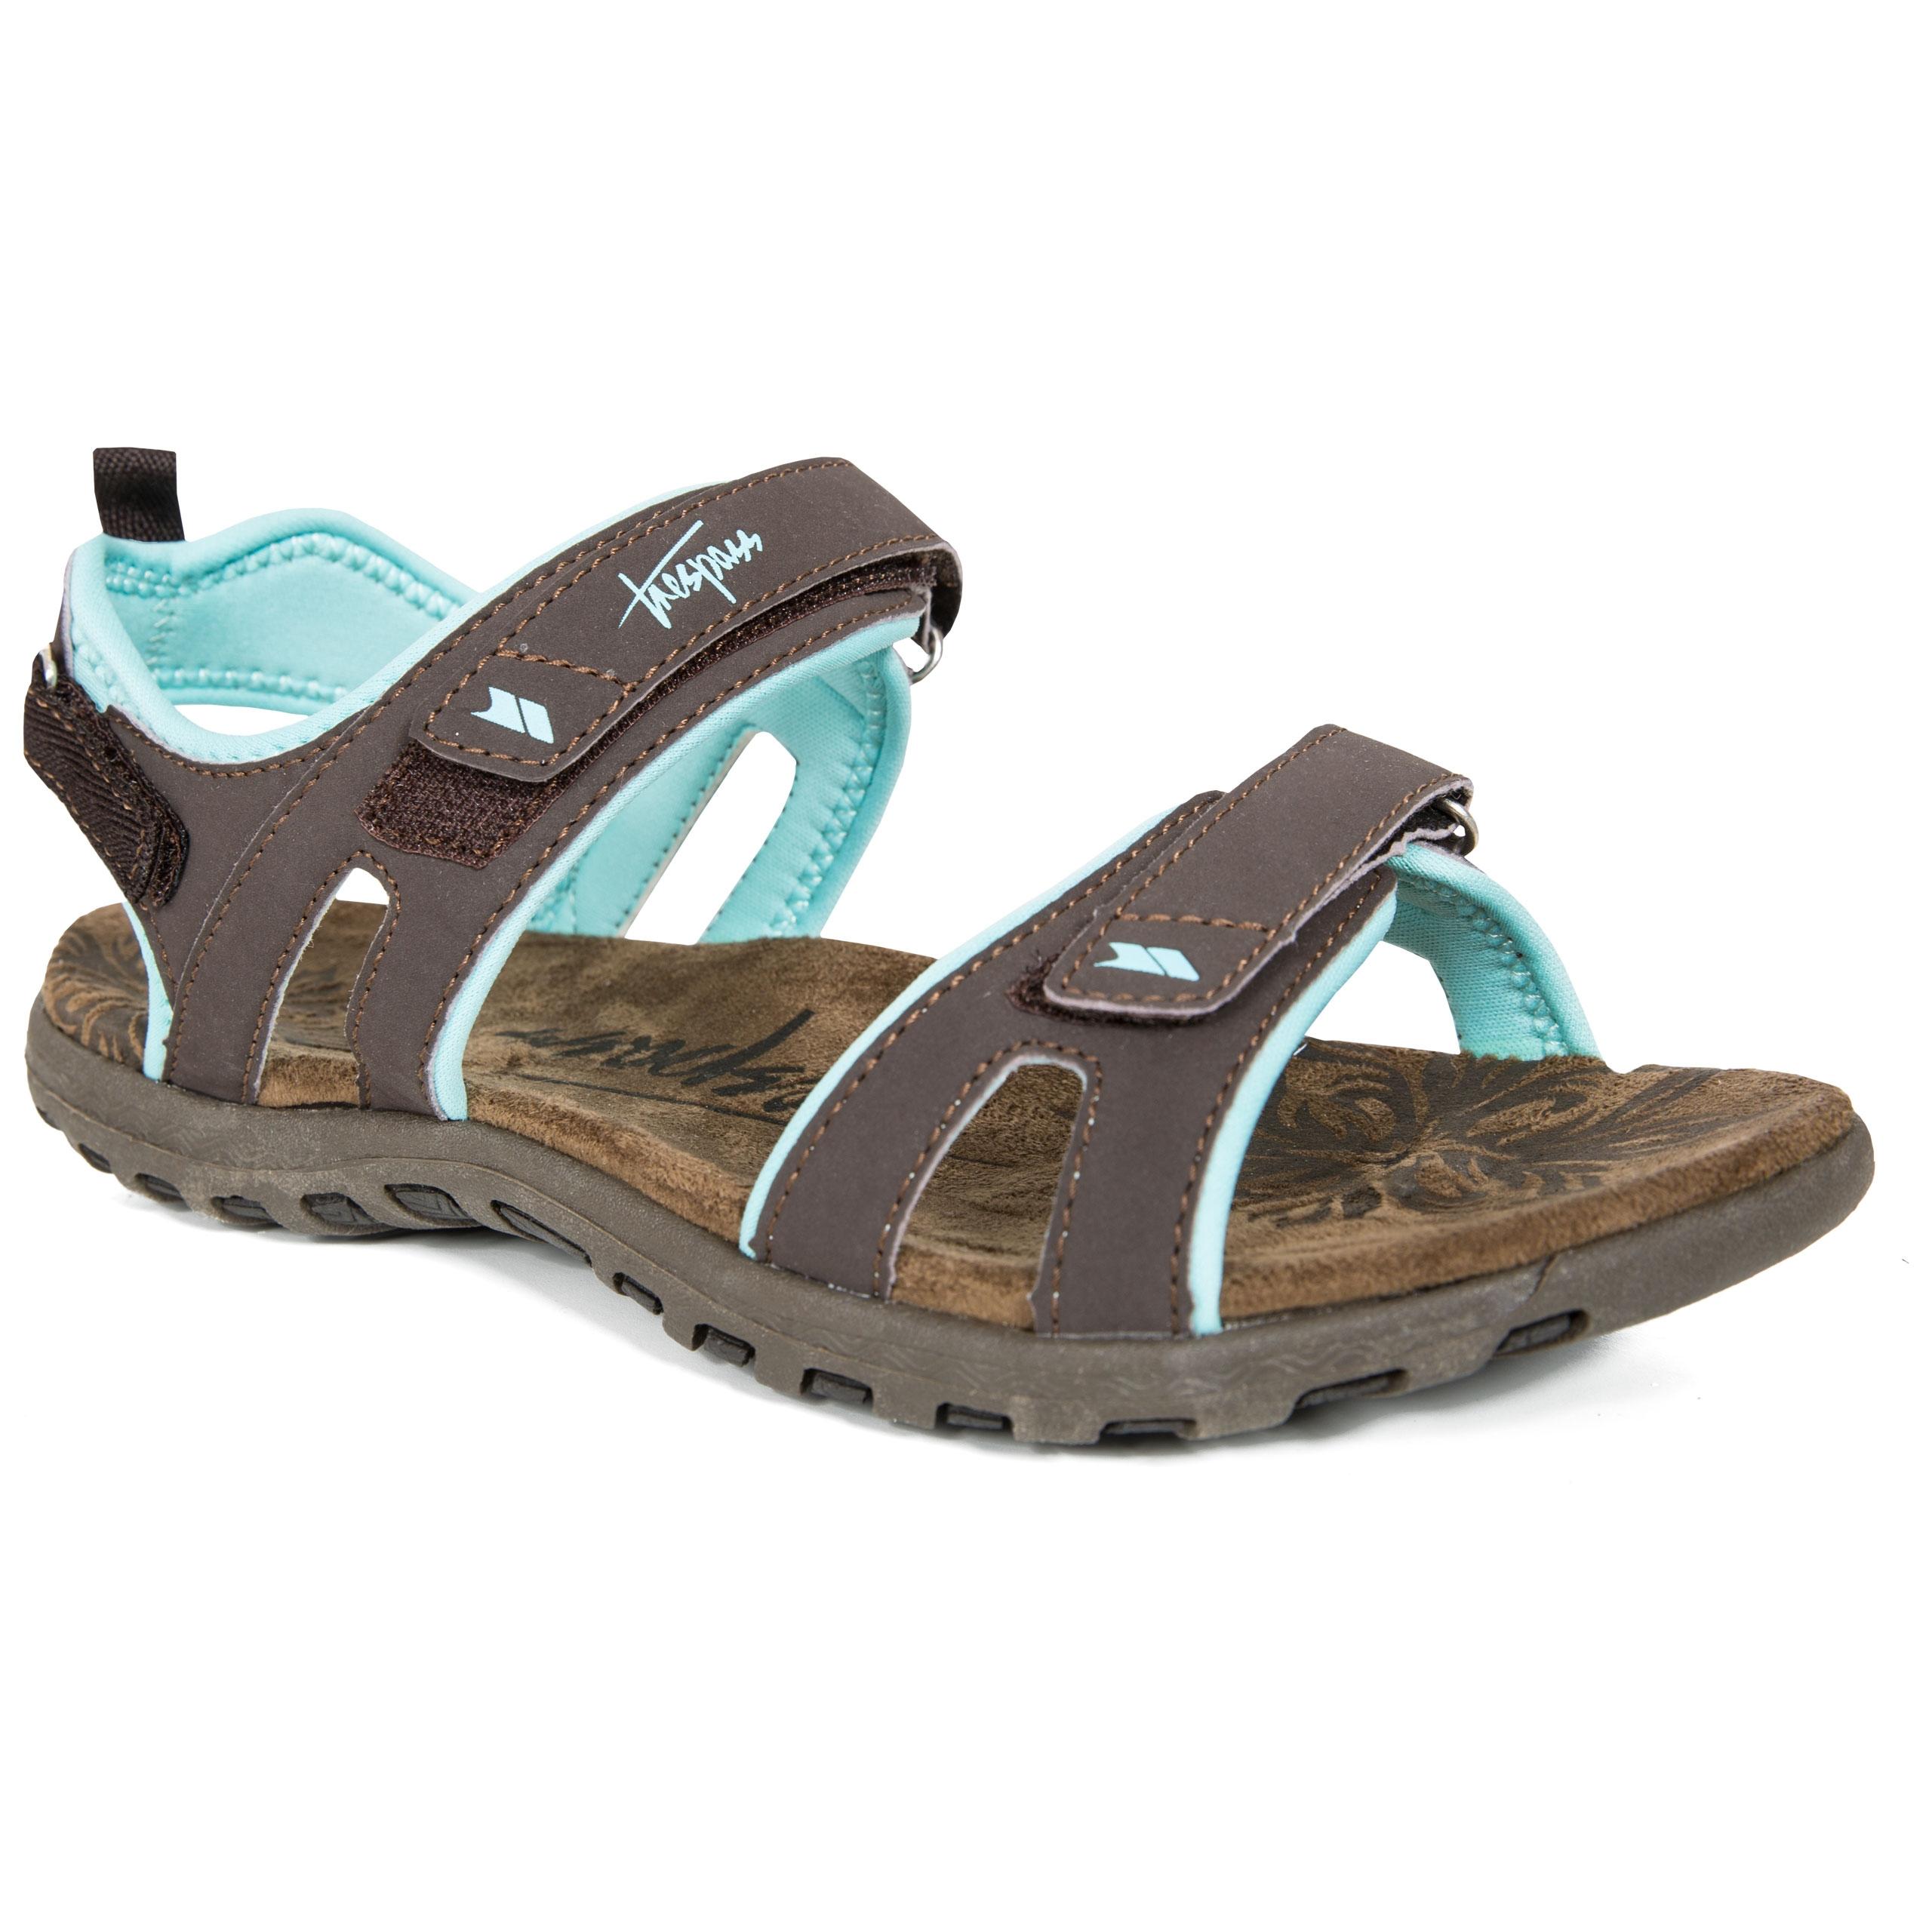 aeb96e643082 Serac Women s Walking Sandals